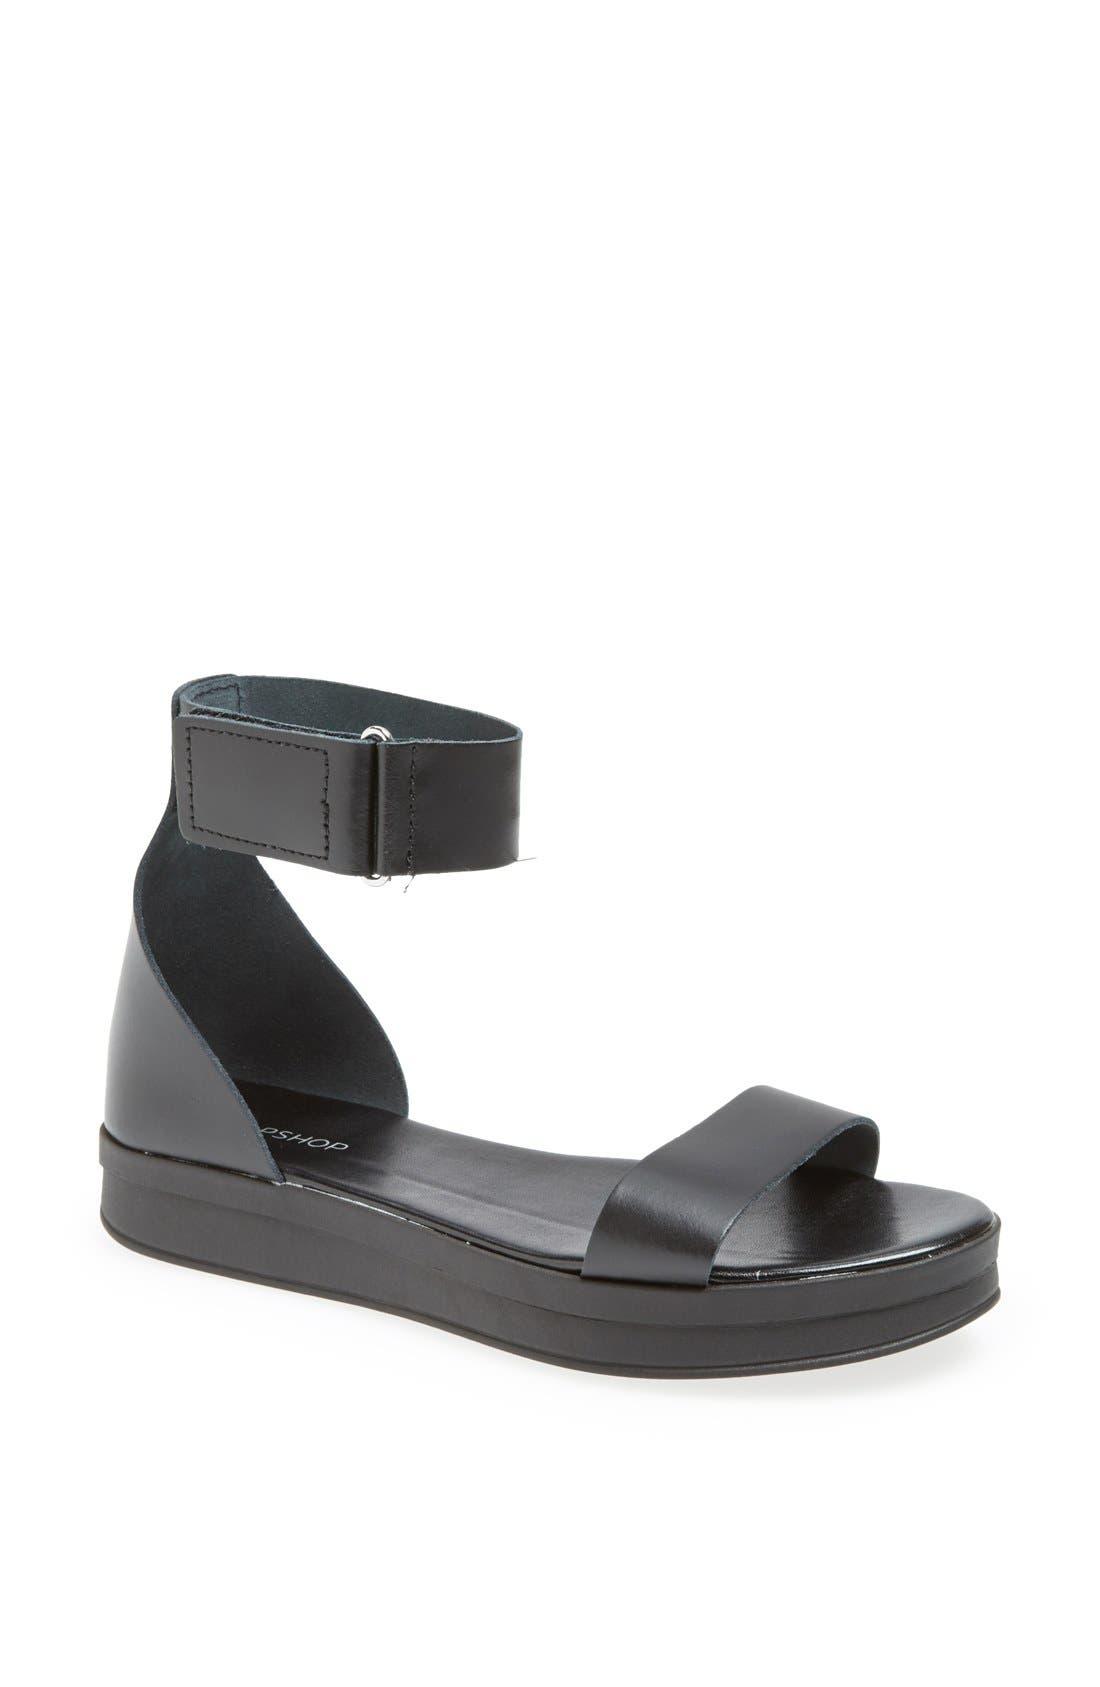 Alternate Image 1 Selected - Topshop 'Harper' Sandal